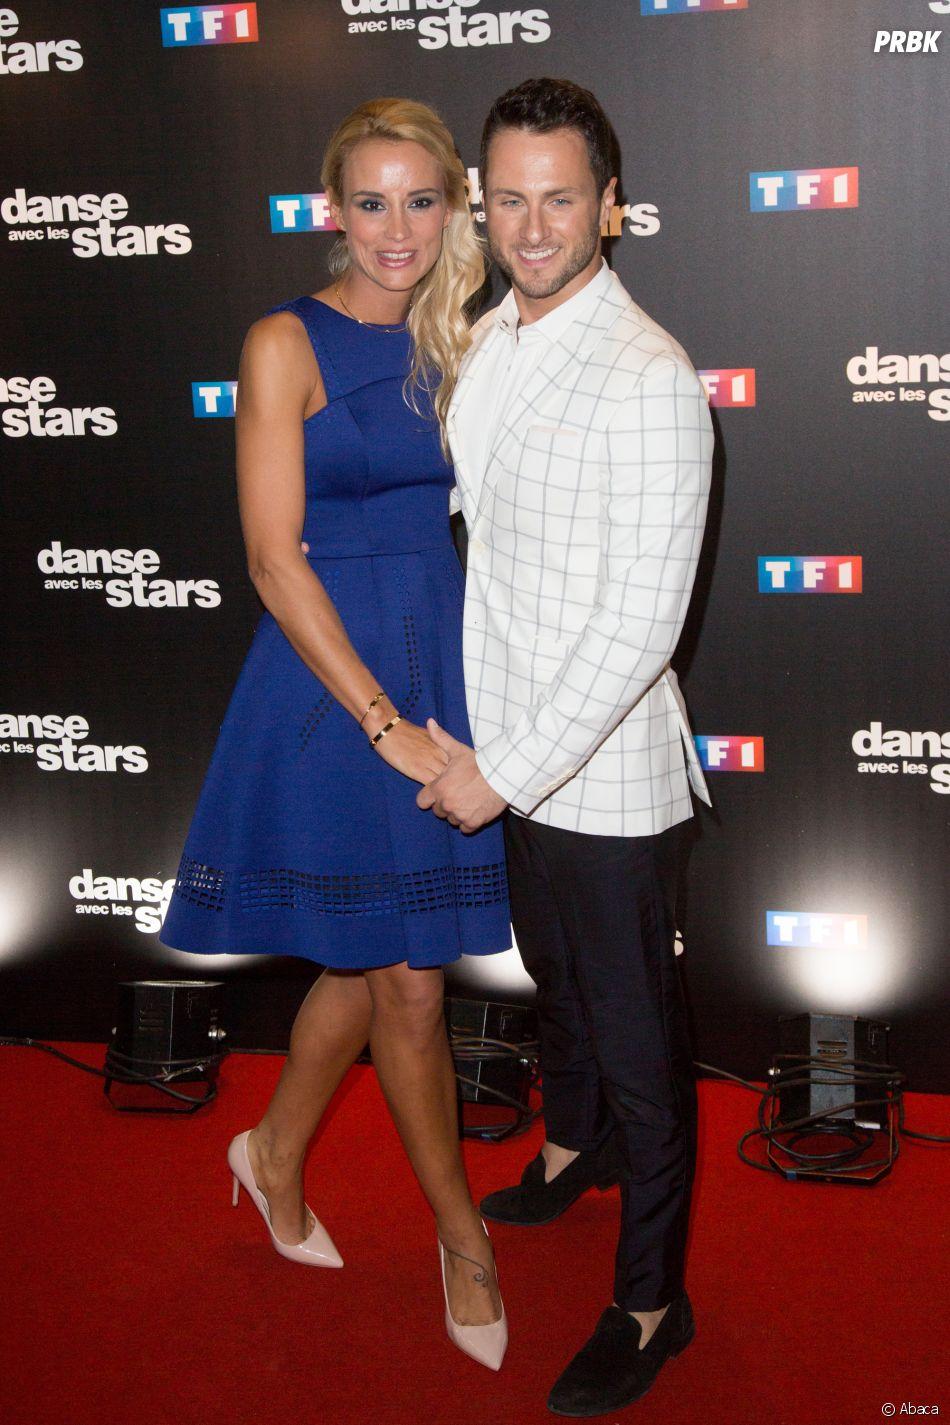 Danse avec les stars 8 : Elodie Gossuin et Christian Millette danseront ensemble !